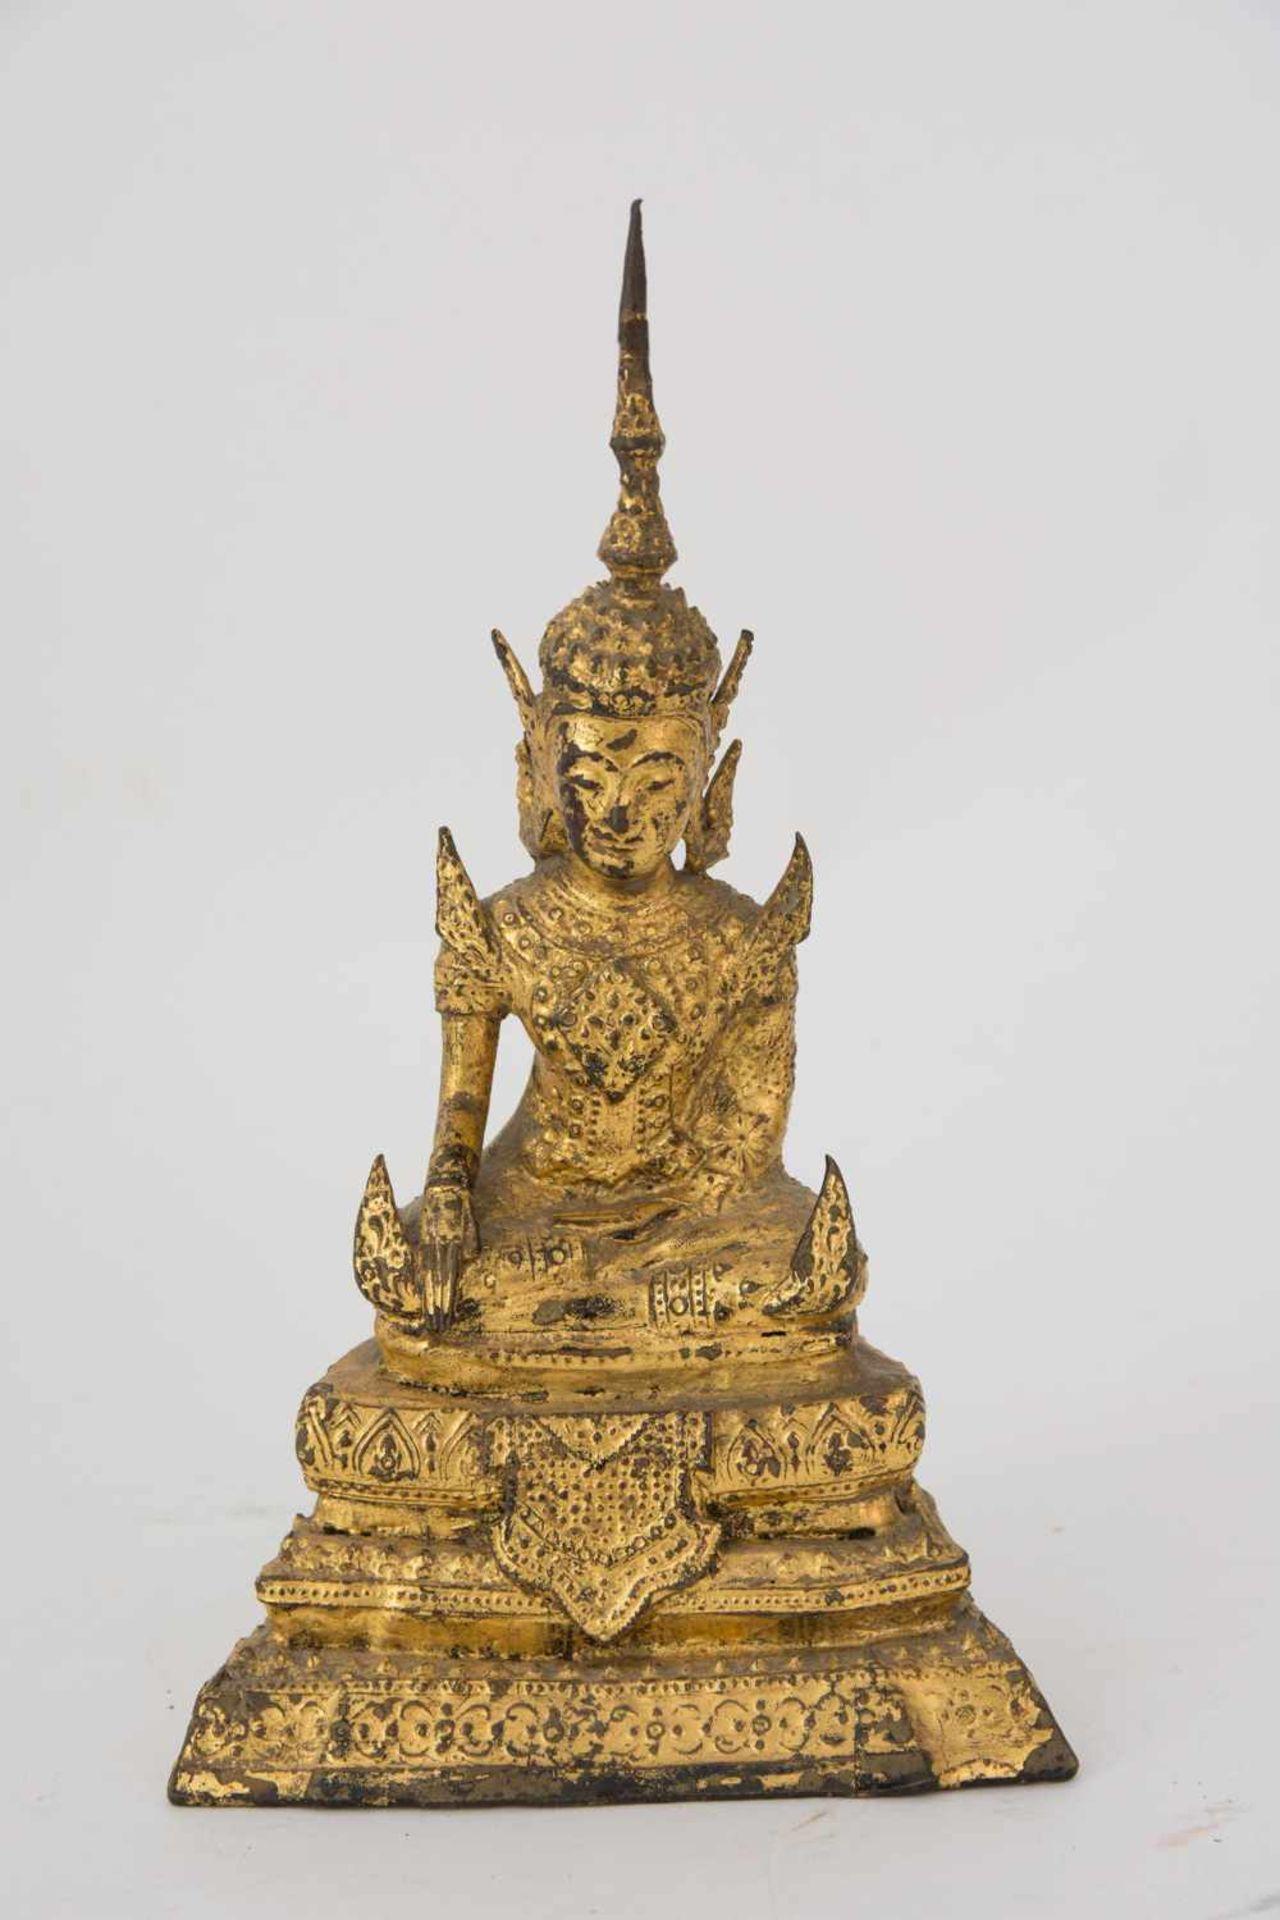 Los 8 - FIREGILT BRONZE BUDDHA SCULPTURE, probably Thailand A firegilt bronze Buddha sculpture probably